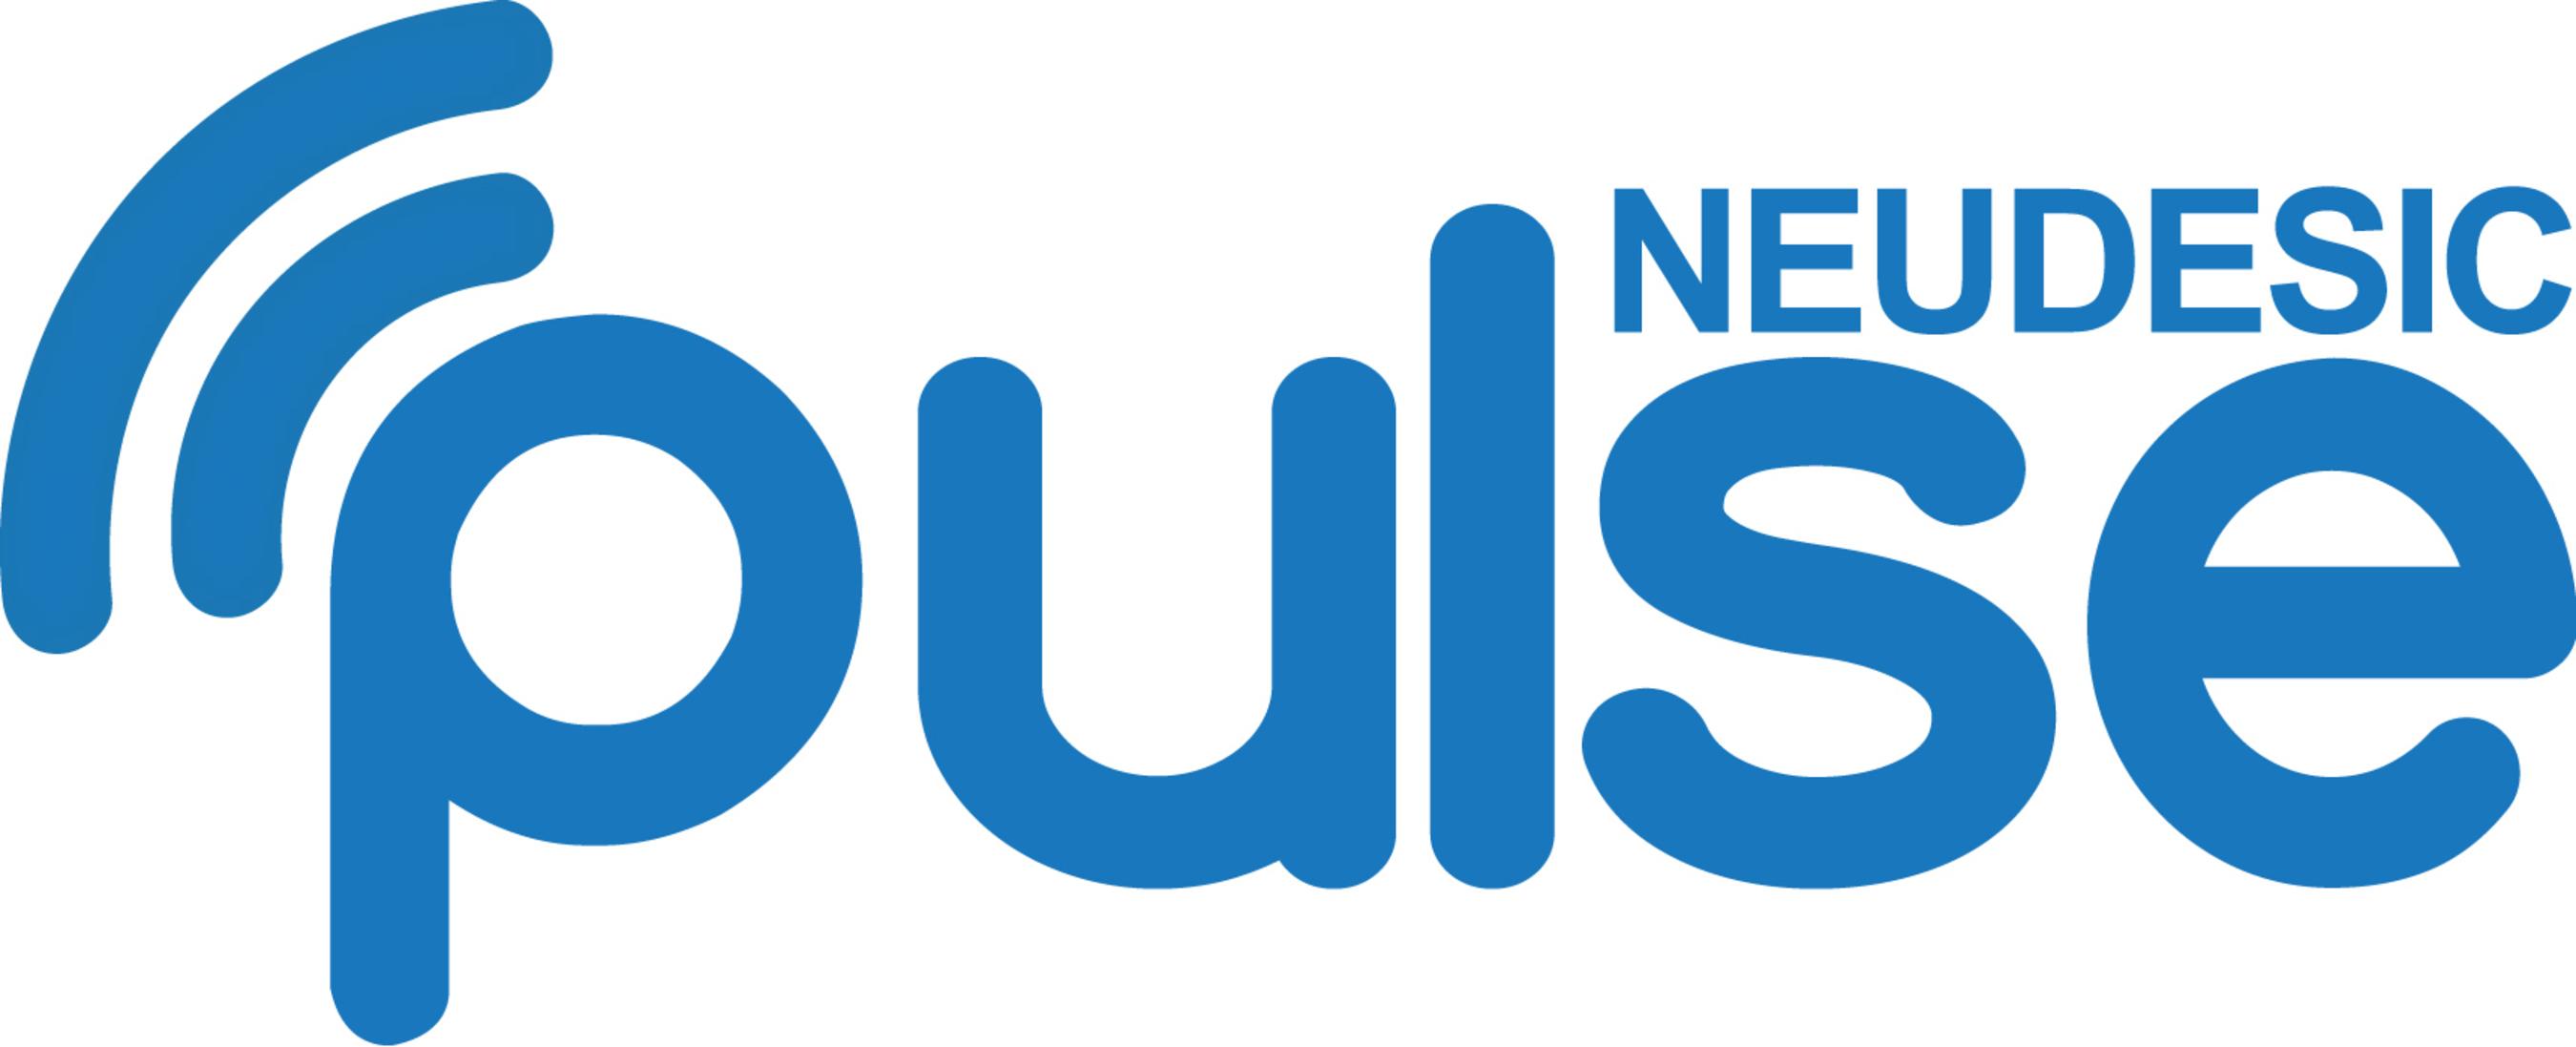 Neudesic Pulse Logo (PRNewsFoto/Neudesic)